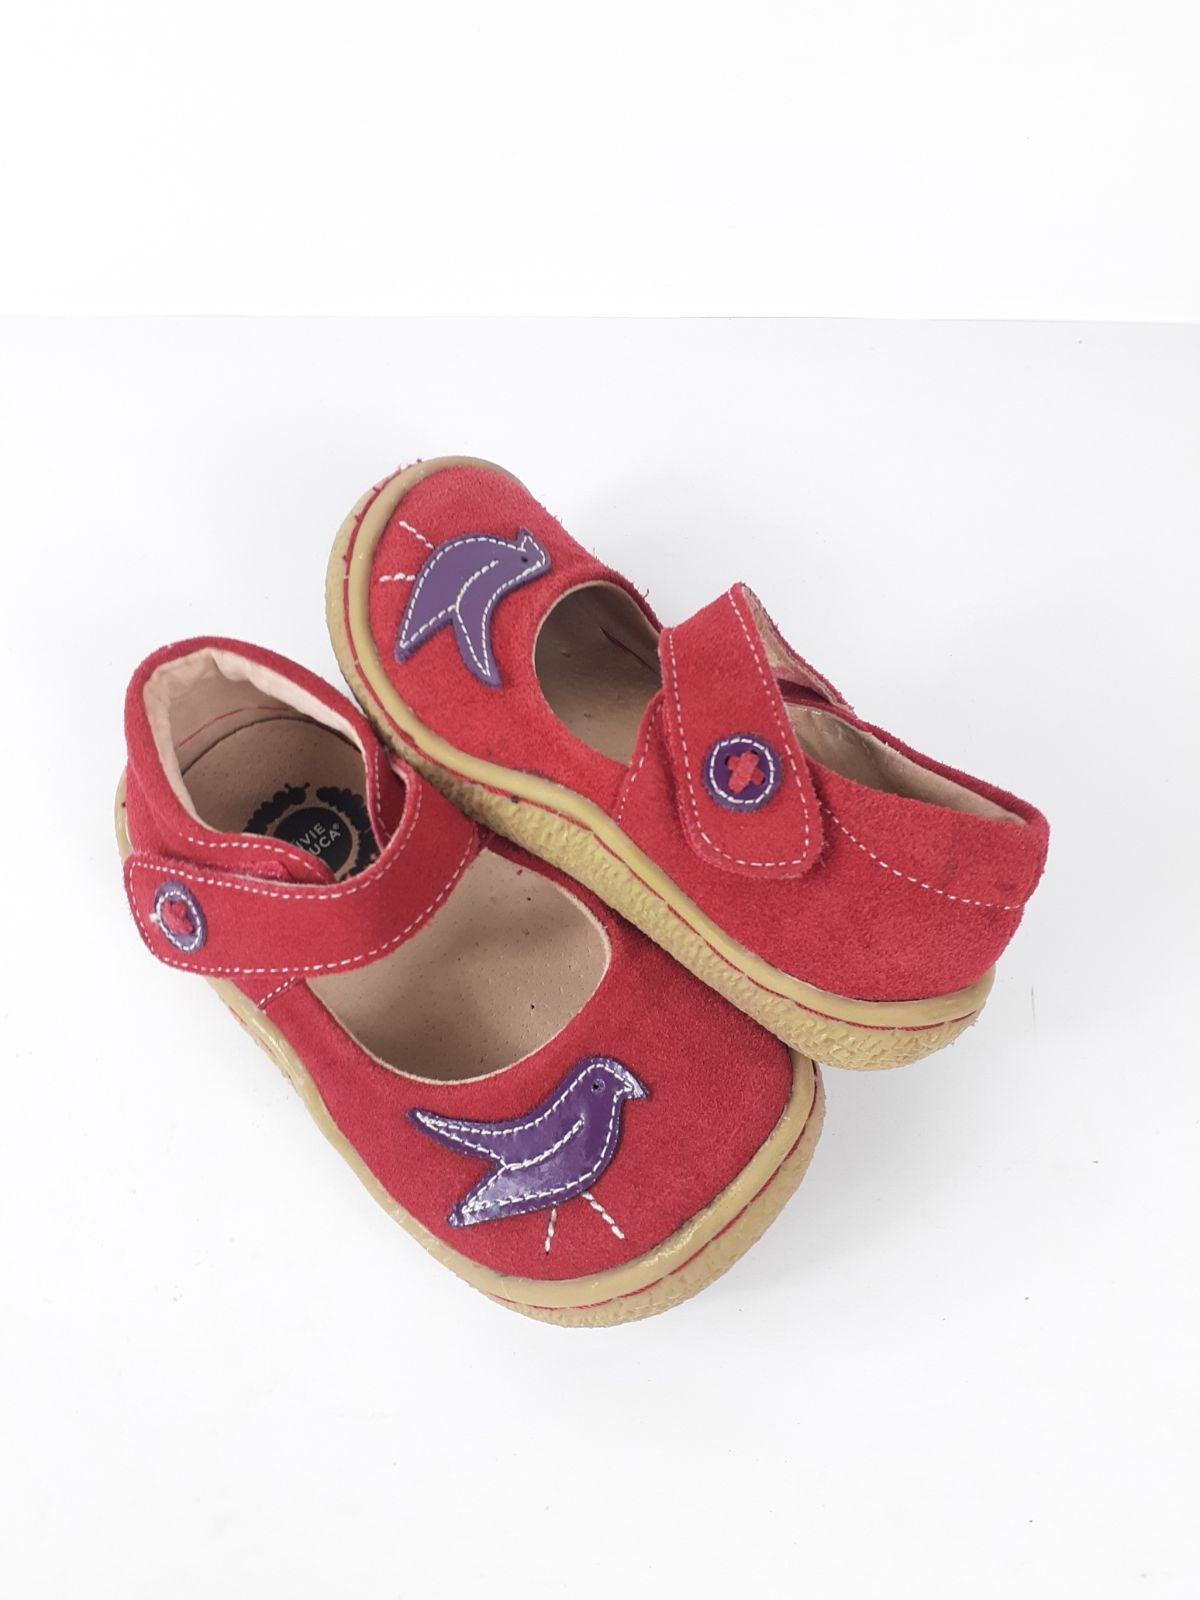 Livie and Luca Pio Pio Shoes Size 7